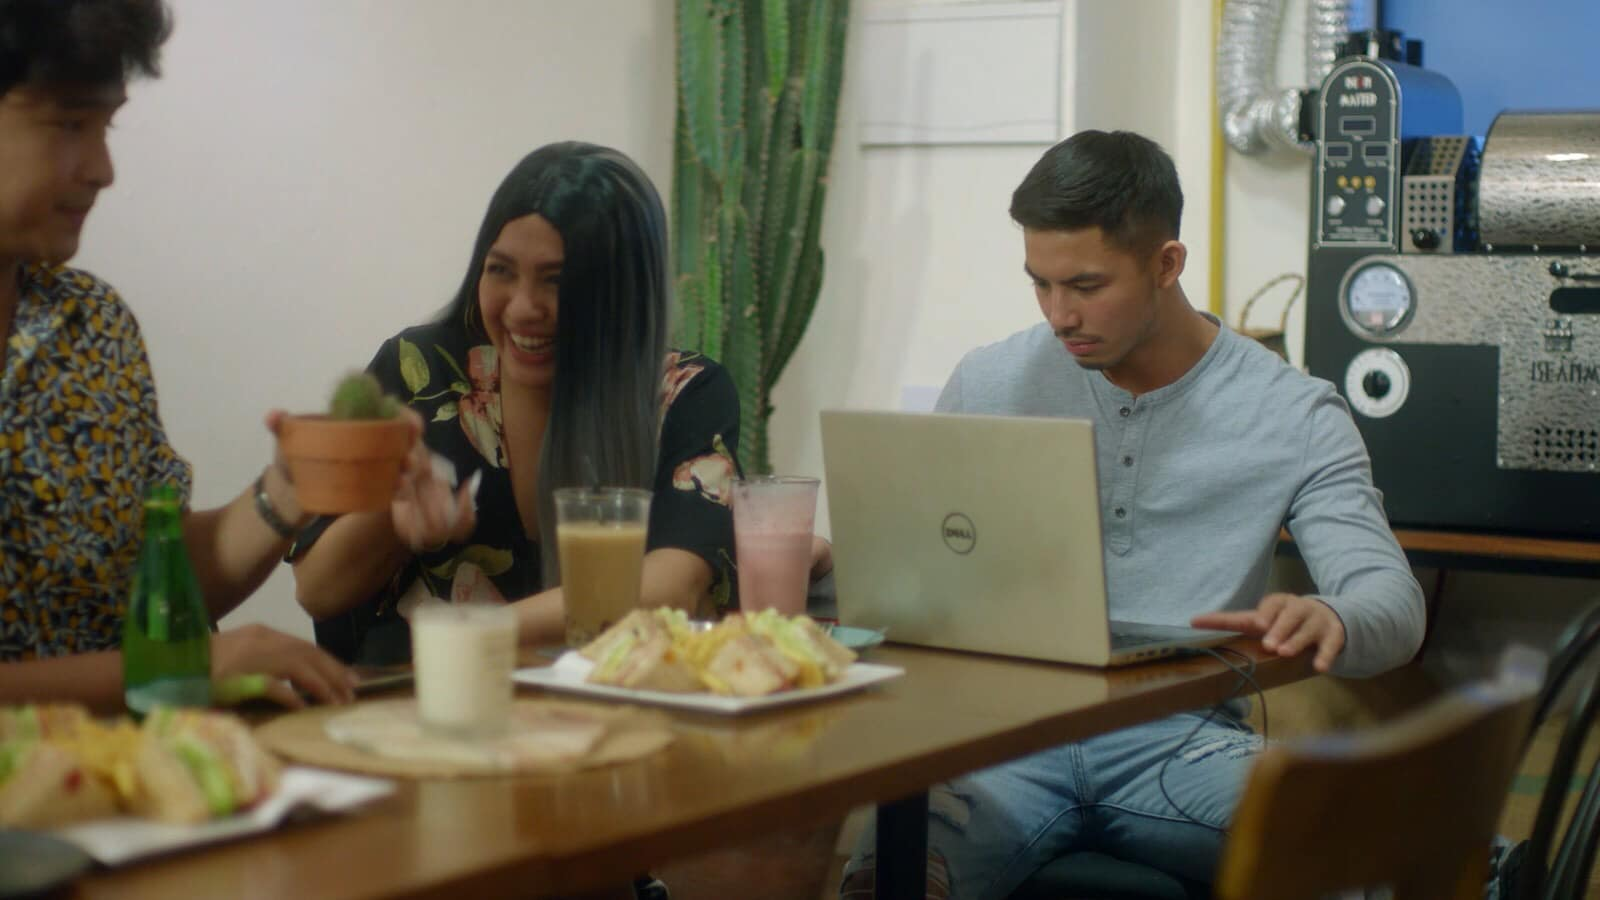 Jane Oineza, Jerome Ponce, and Tony Labrusca in Ang henerasyong sumuko sa love (2019)